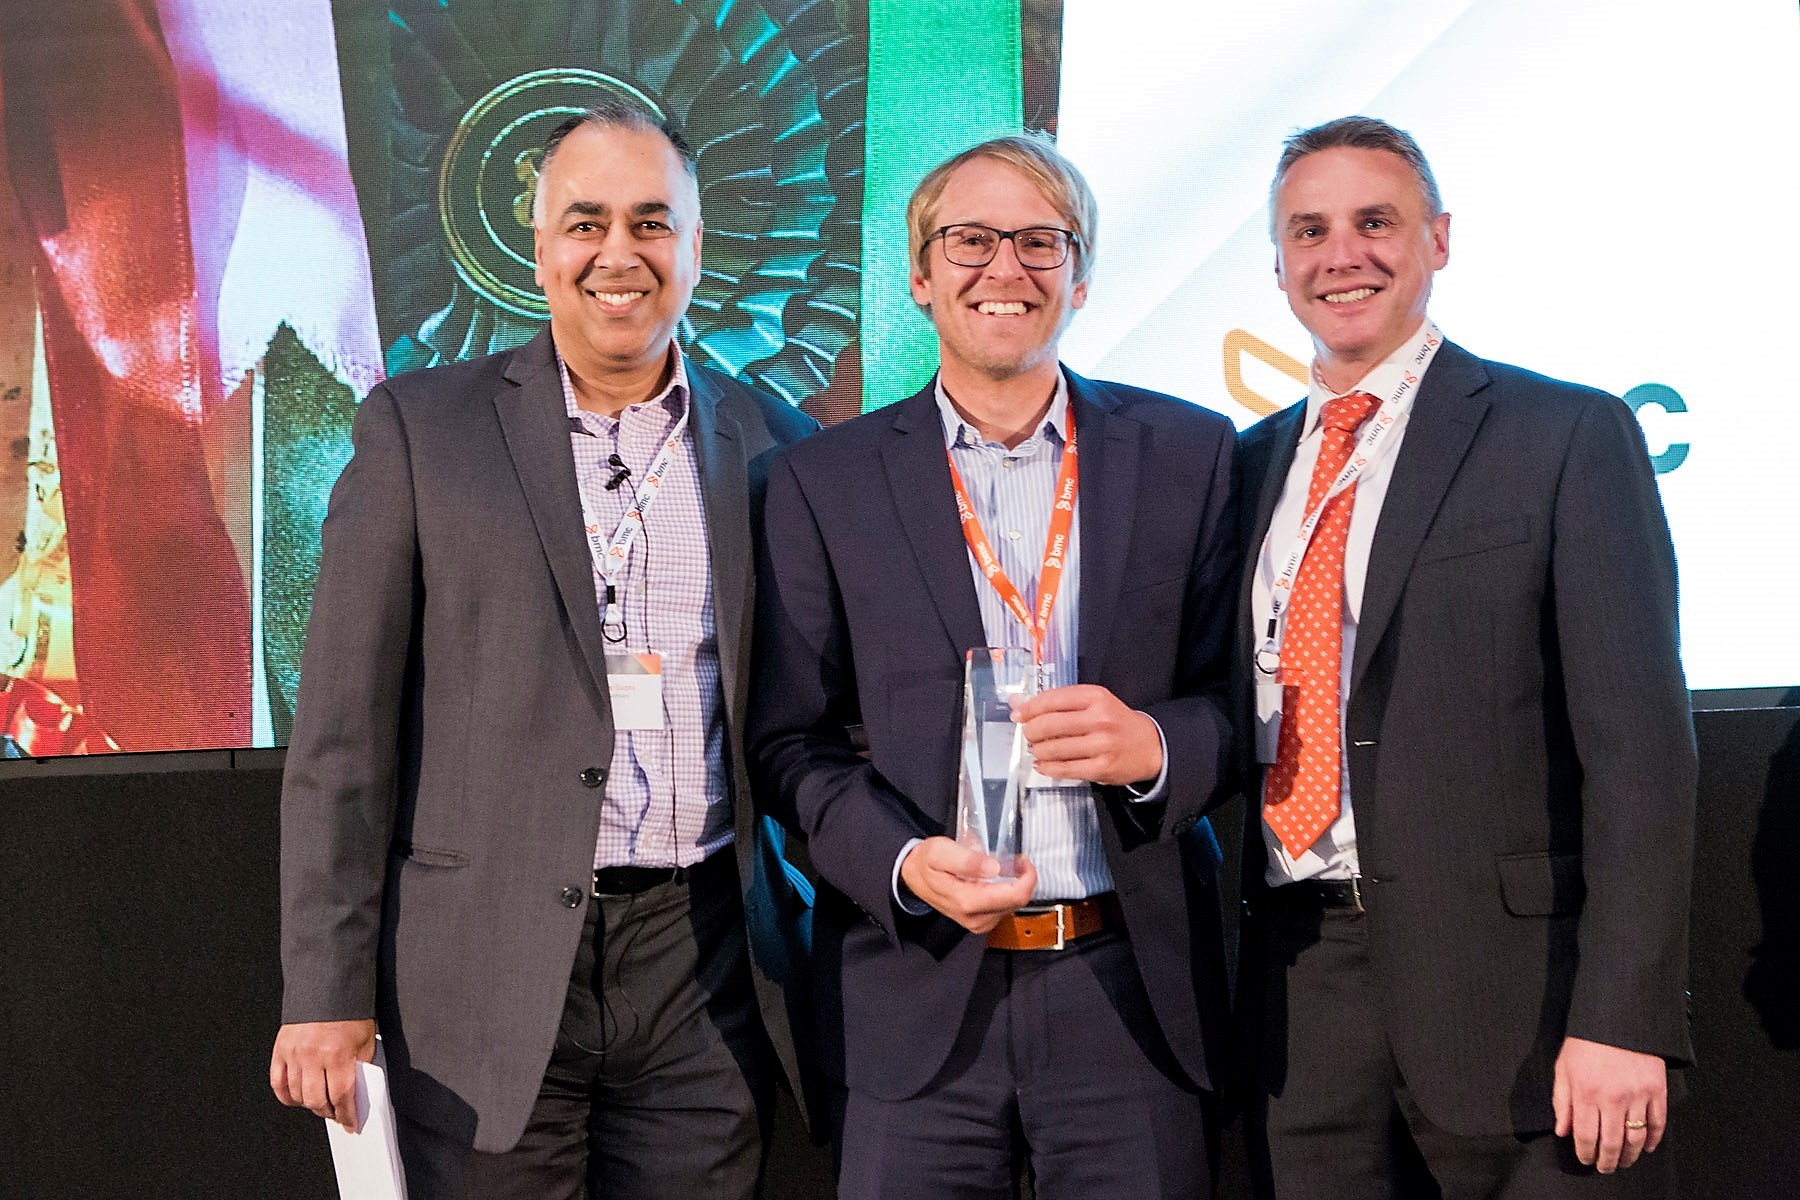 von links nach rechts: Sanjay Gupta (BMC Software), Thomas Fetsch (VIPCON),Ollie Norman (BMC Software)